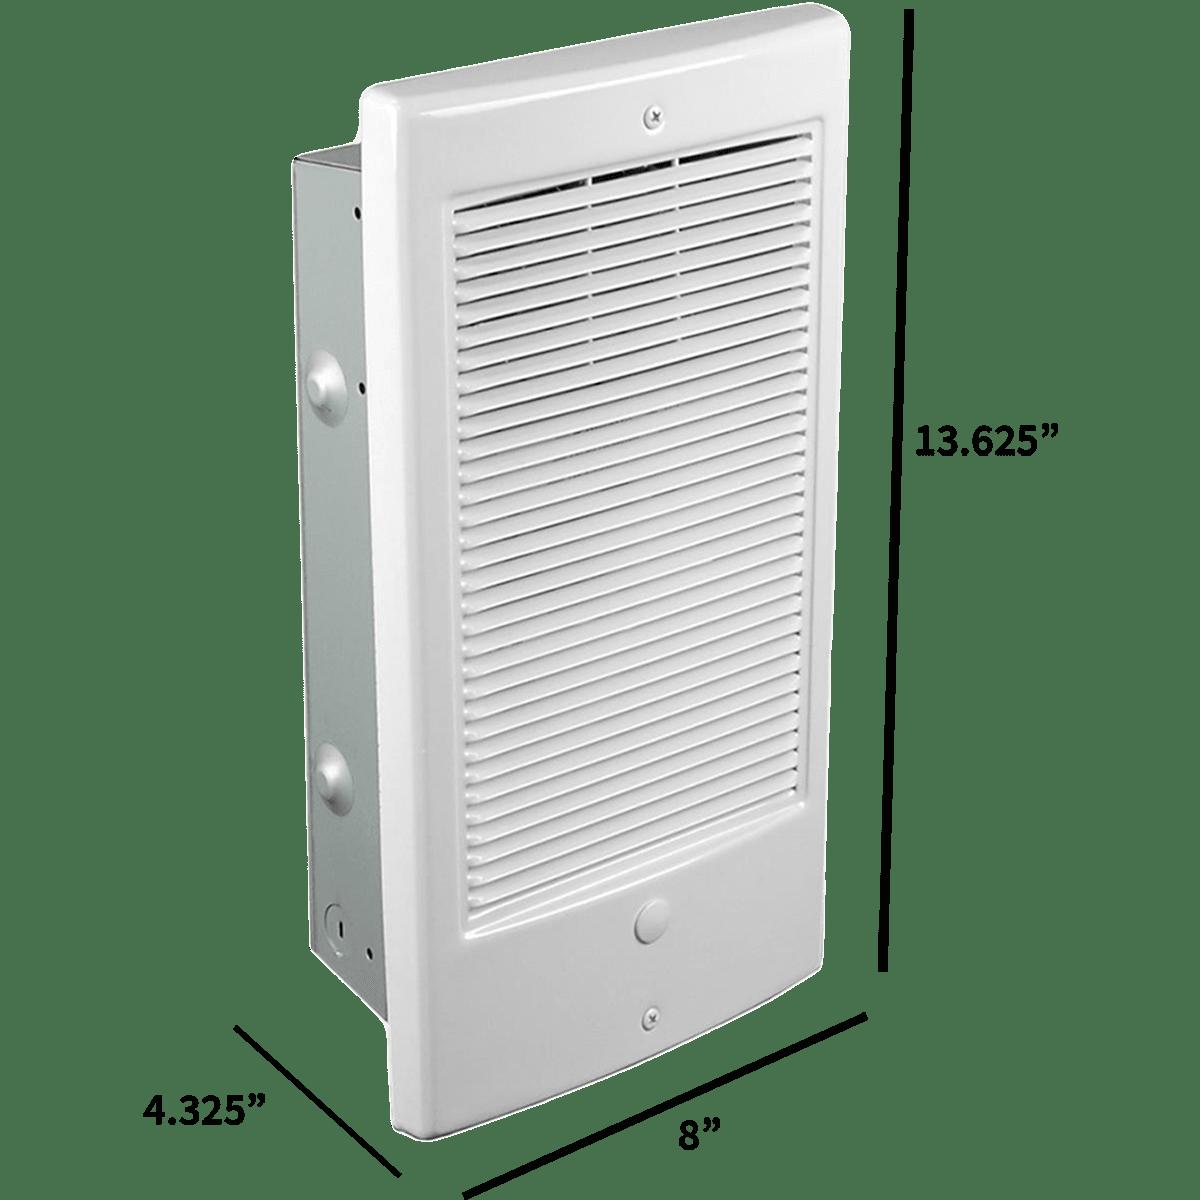 Dimplex Twh Series Fan Forced Wall Heaters Sylvane 220 Heater Wiring Diagram